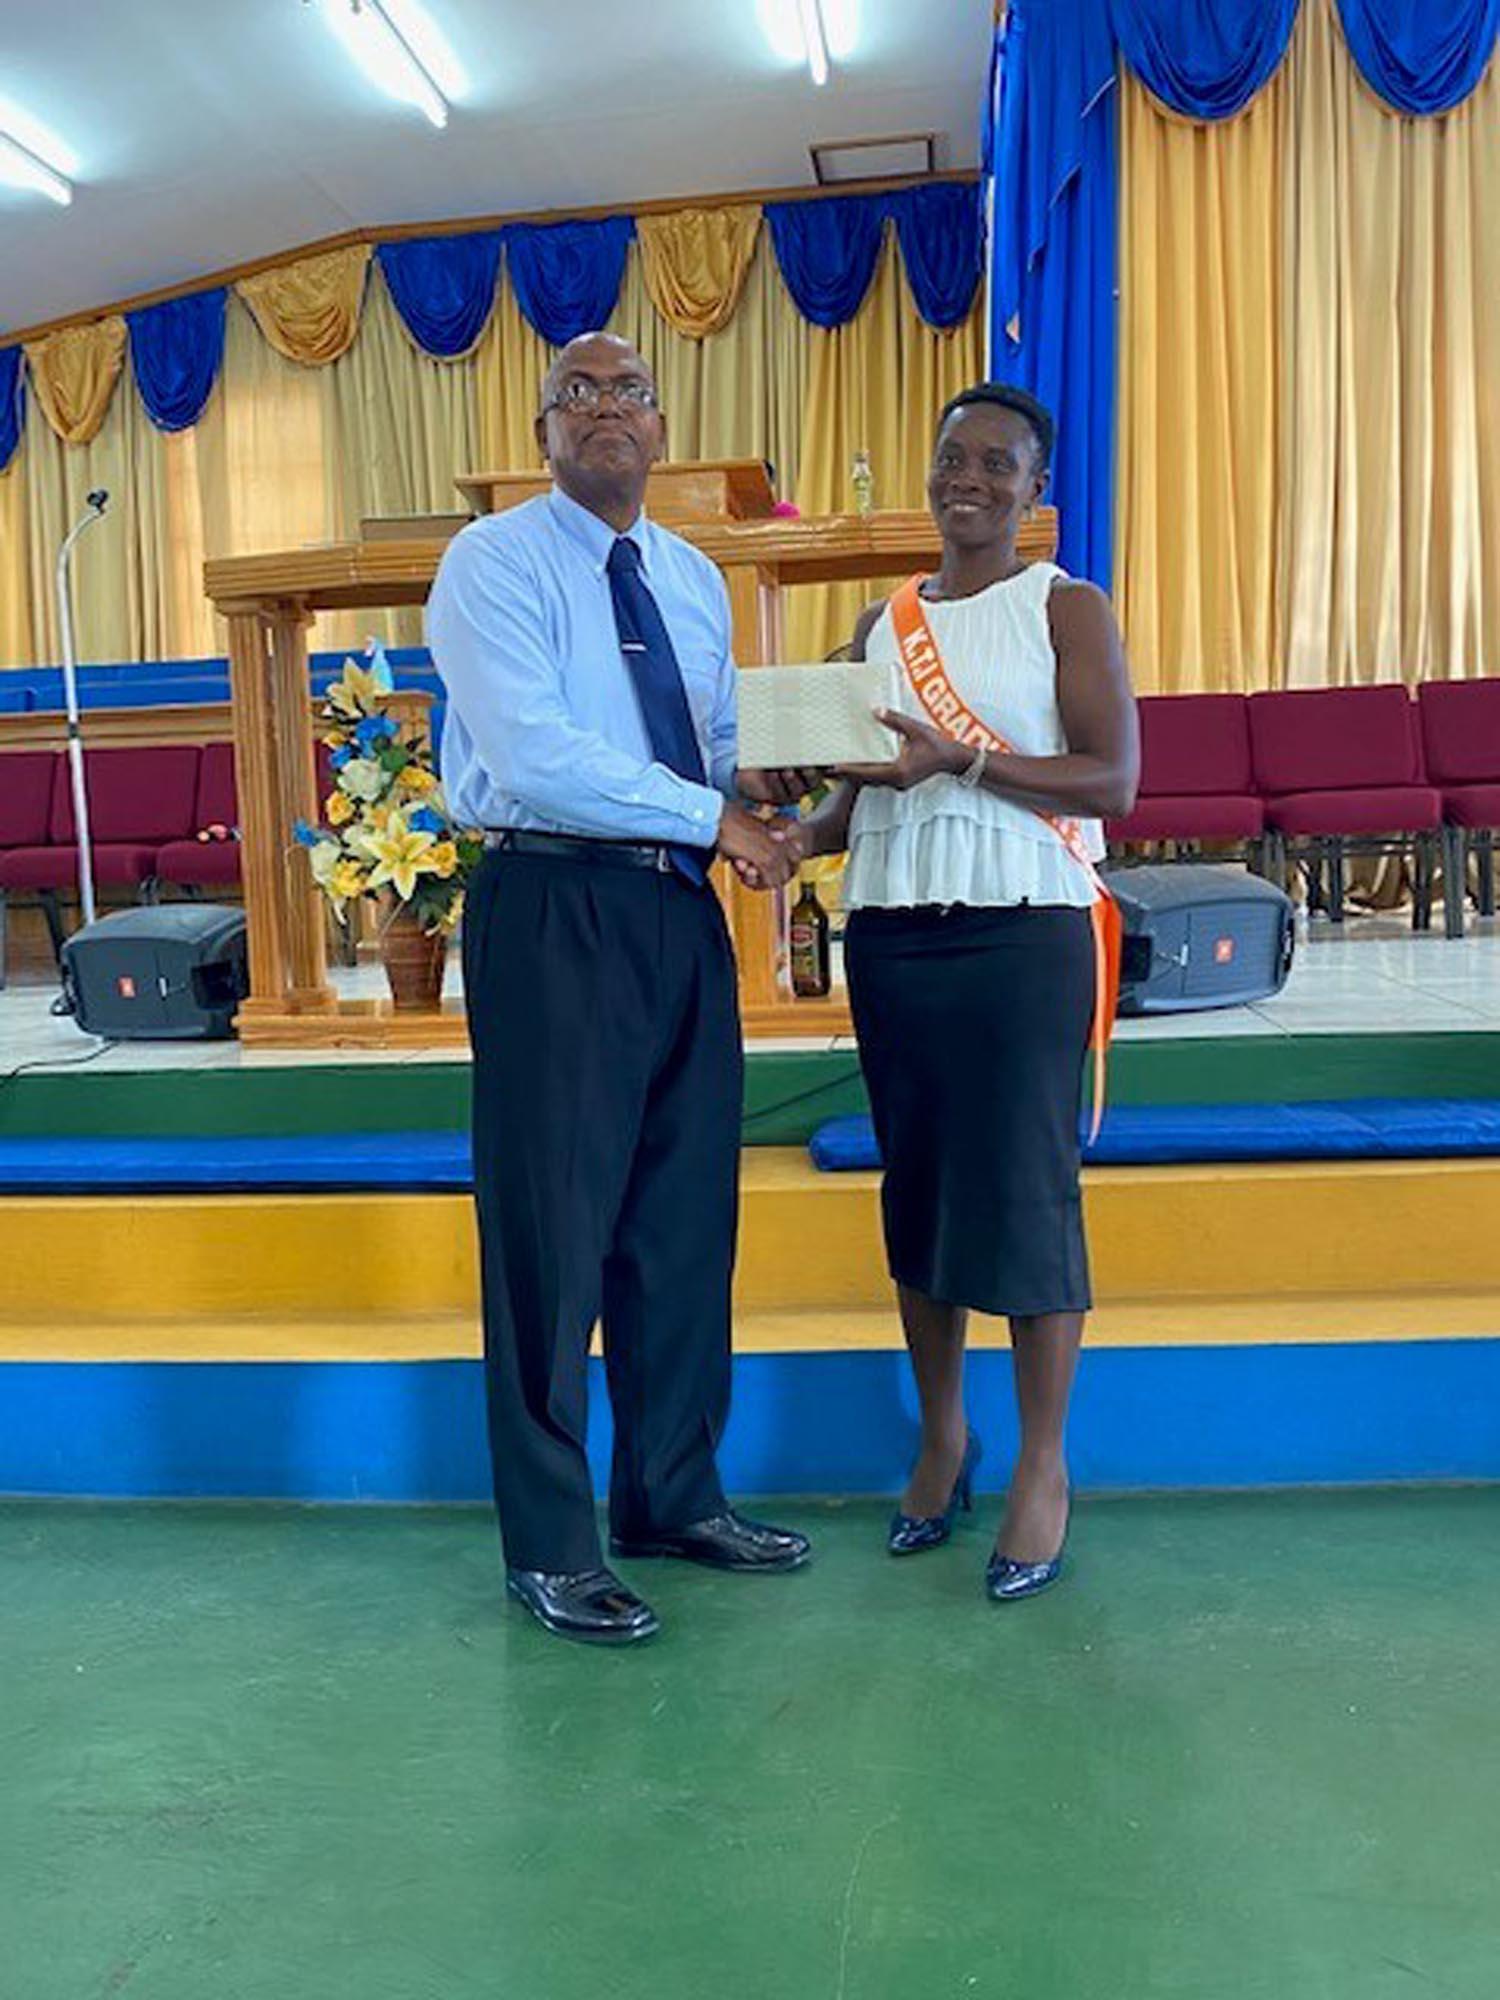 Principal's Award – Lisanne Matthews – MCF Awardee